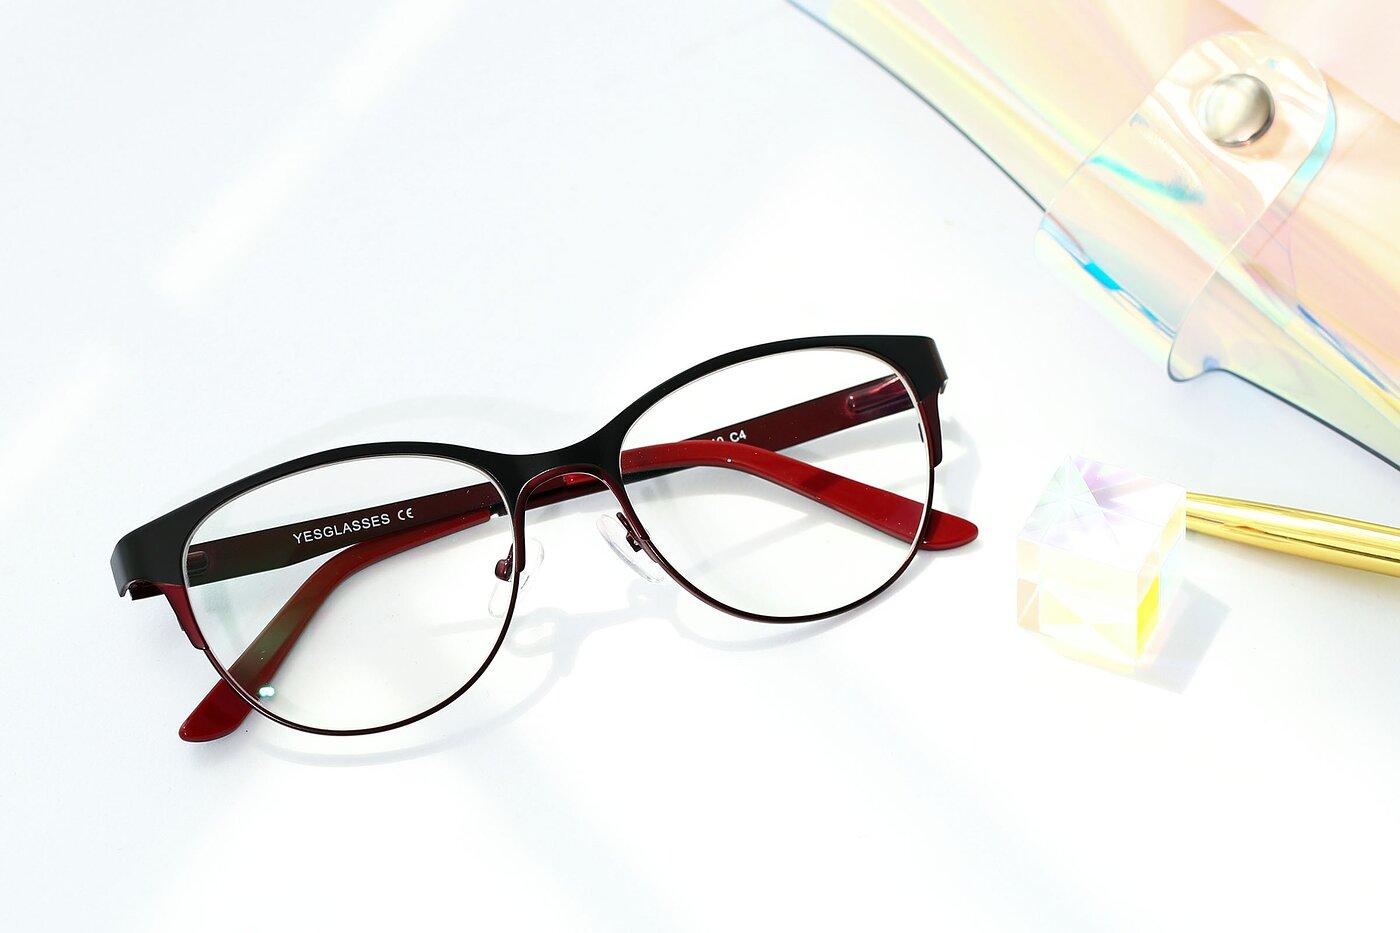 Black-Burgendy Retro-Vintage Browline Metal Eyeglasses